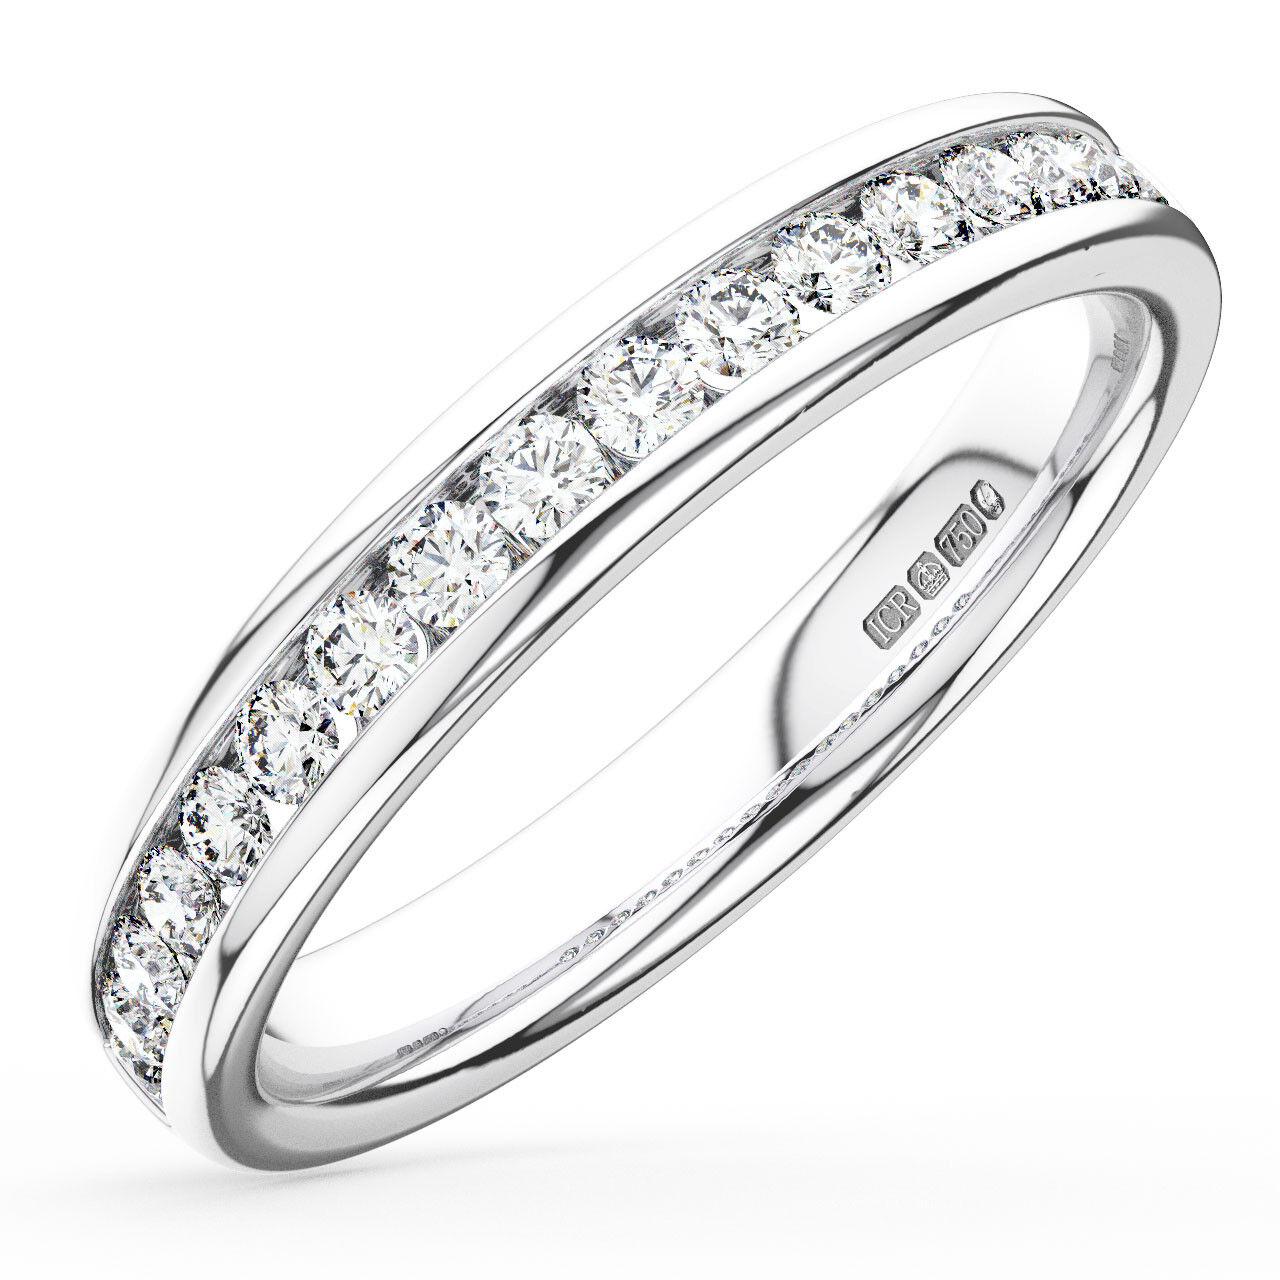 0.35CT Round Brilliant Cut Diamonds Half Eternity Wedding Ring in 9K White gold